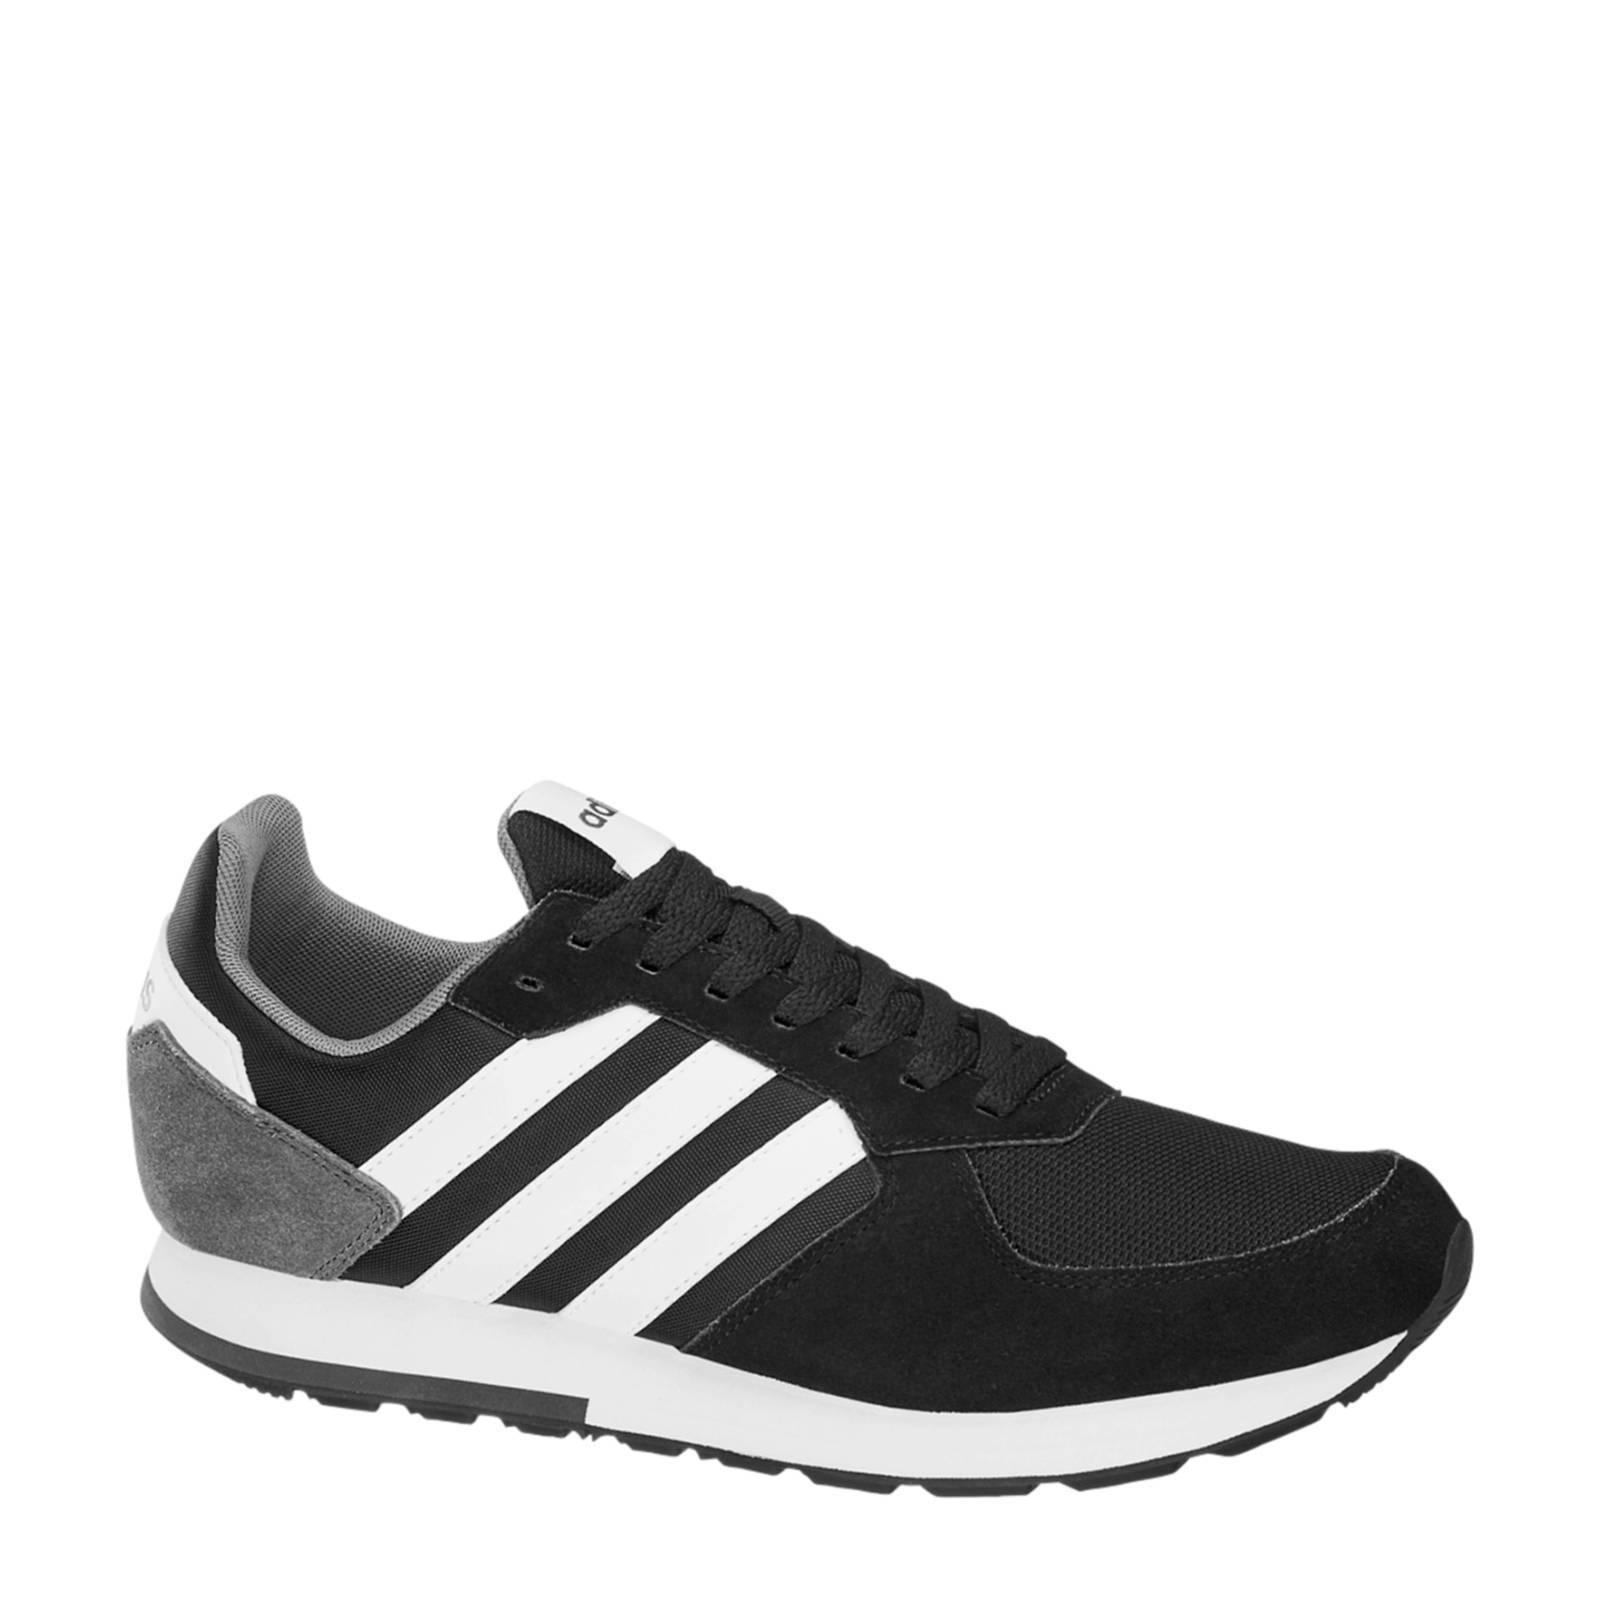 adidas sneakers zwart leer